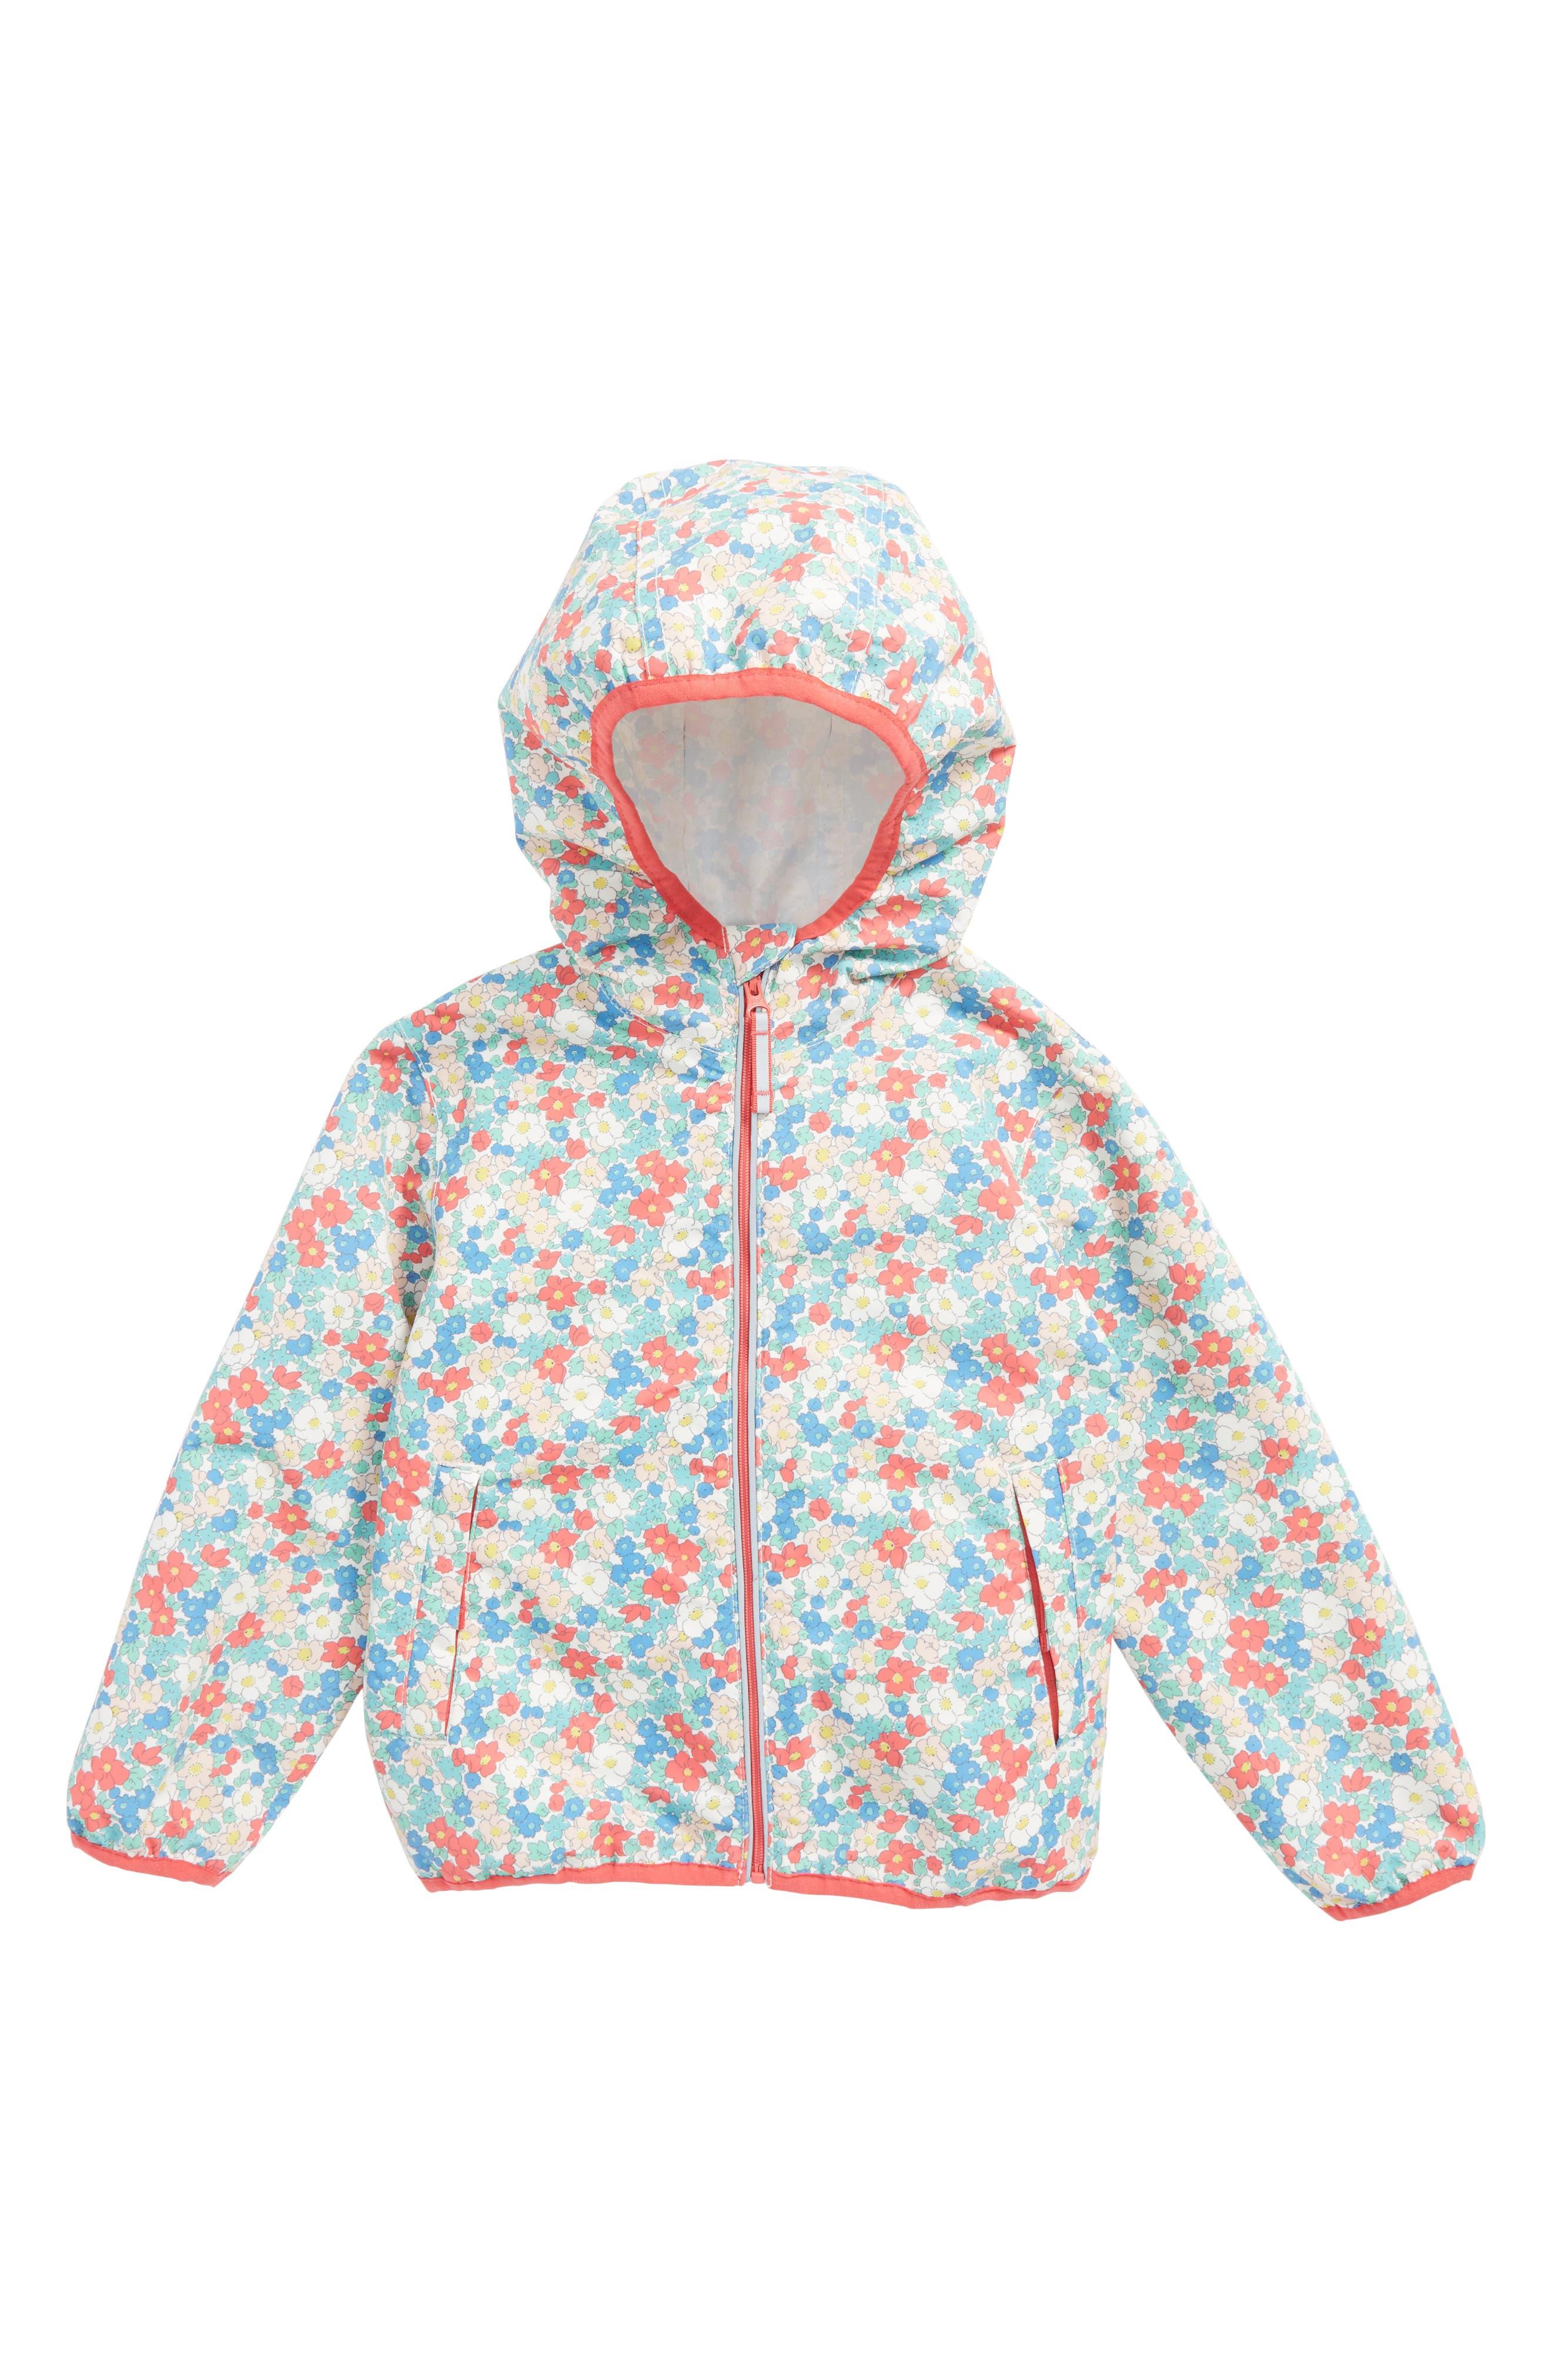 Packaway Waterproof Jacket,                             Main thumbnail 1, color,                             656